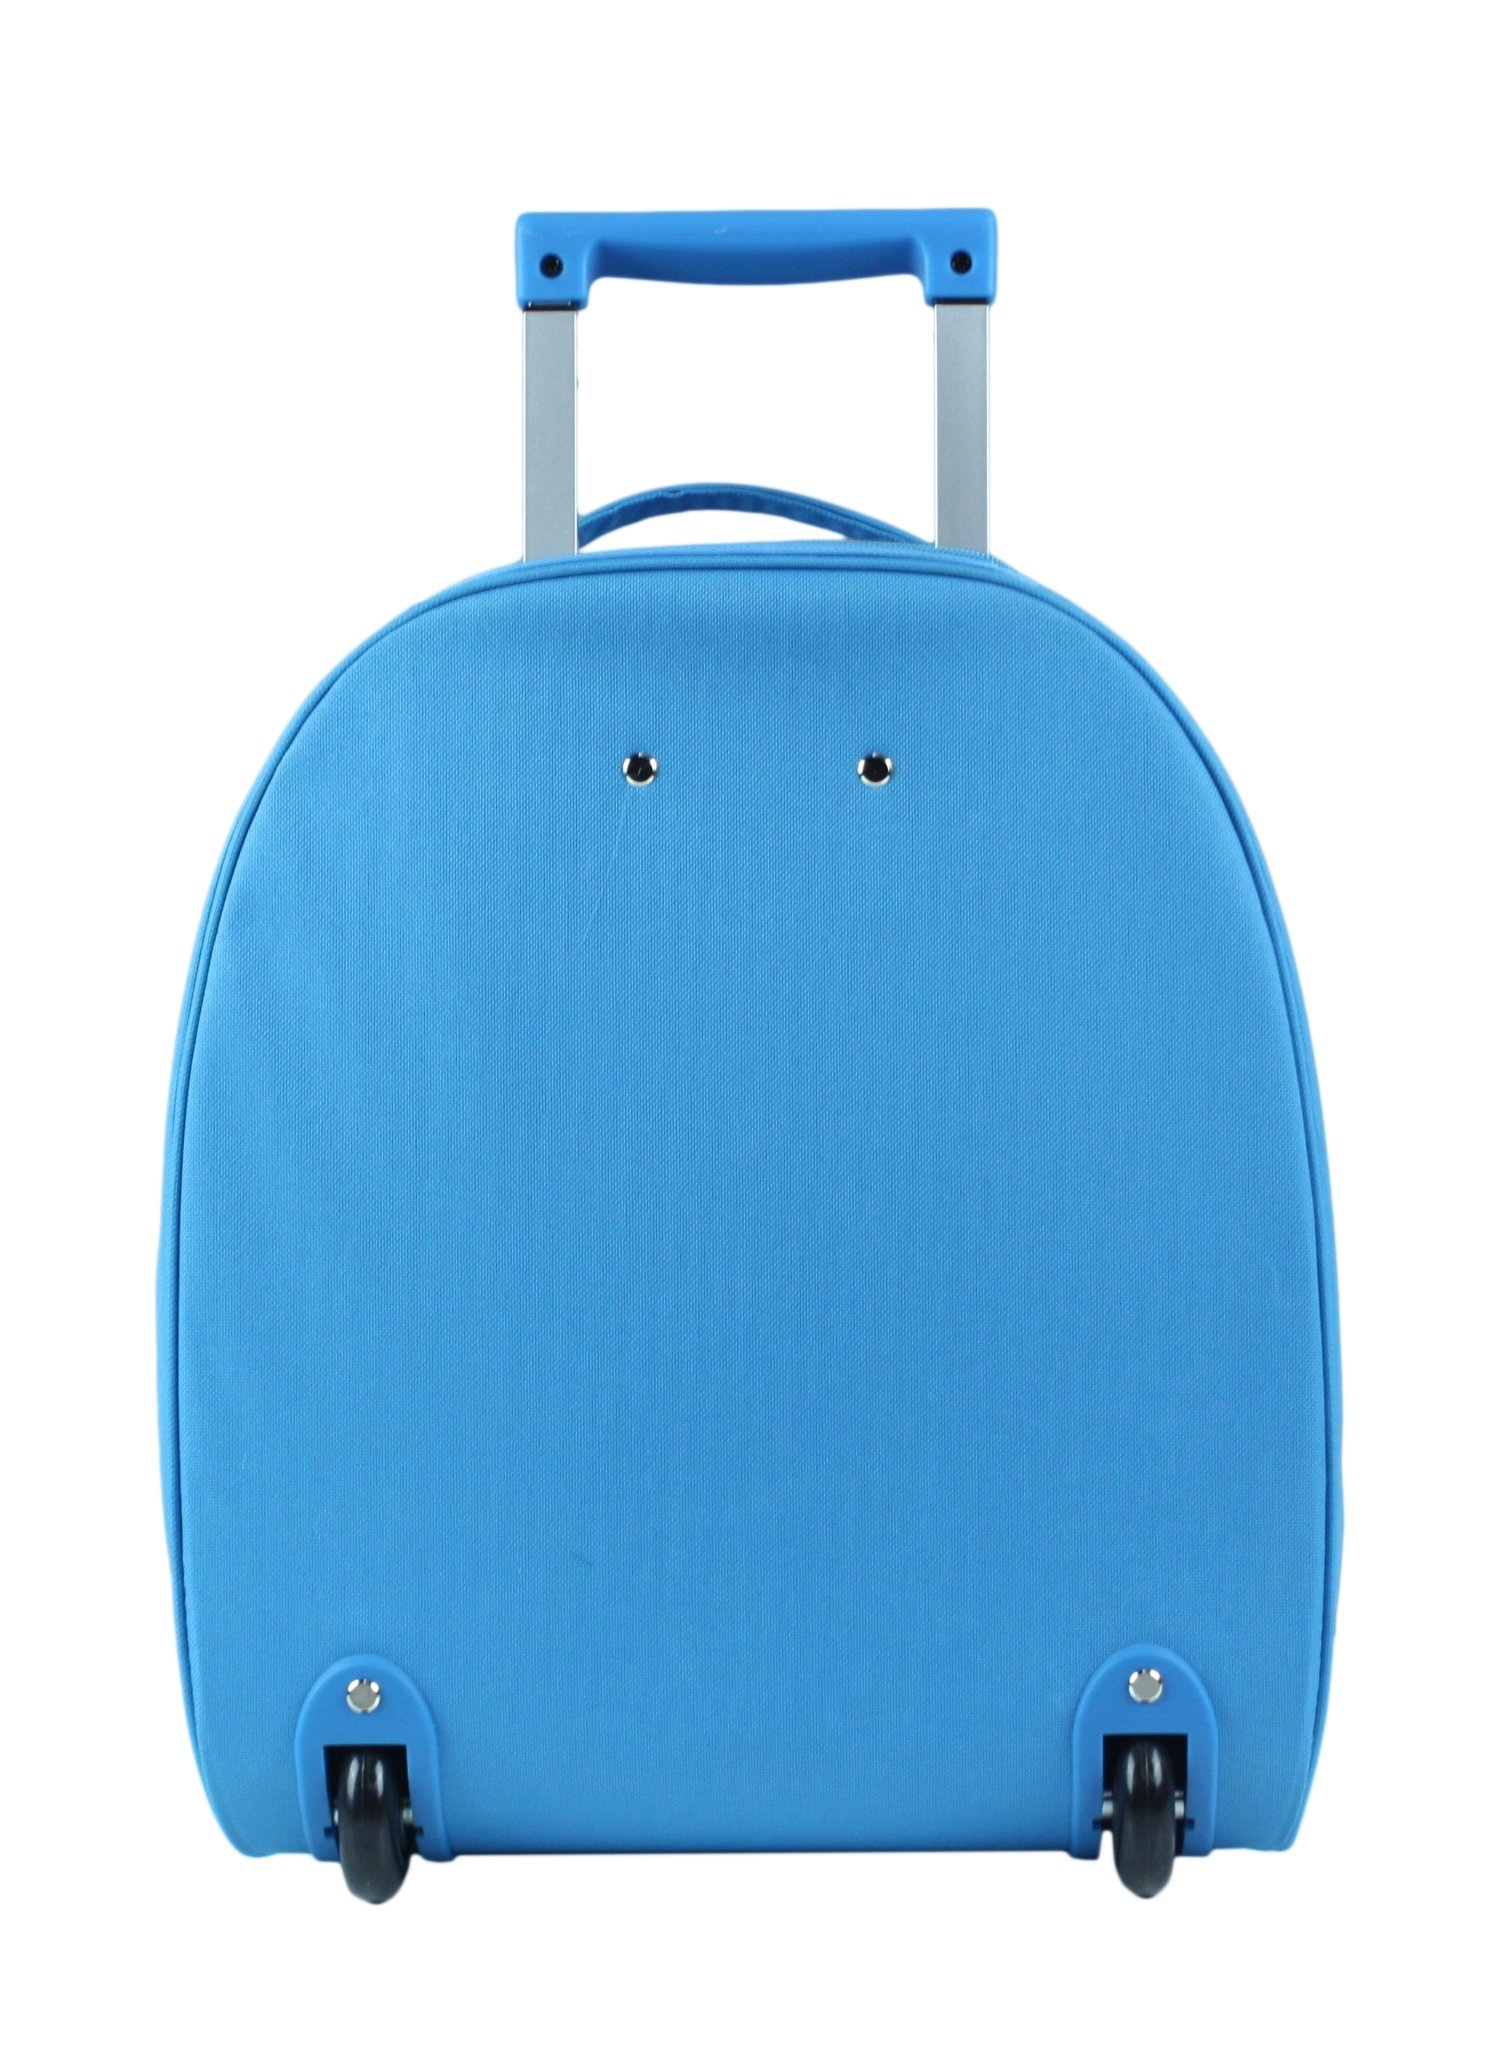 Bayer-Chic-2000-Bouncie-Kinder-Trolley-mit-3D-Pinguin-Motiv-Reisetrolley-Kindergepck-40-cm-gro-Blau